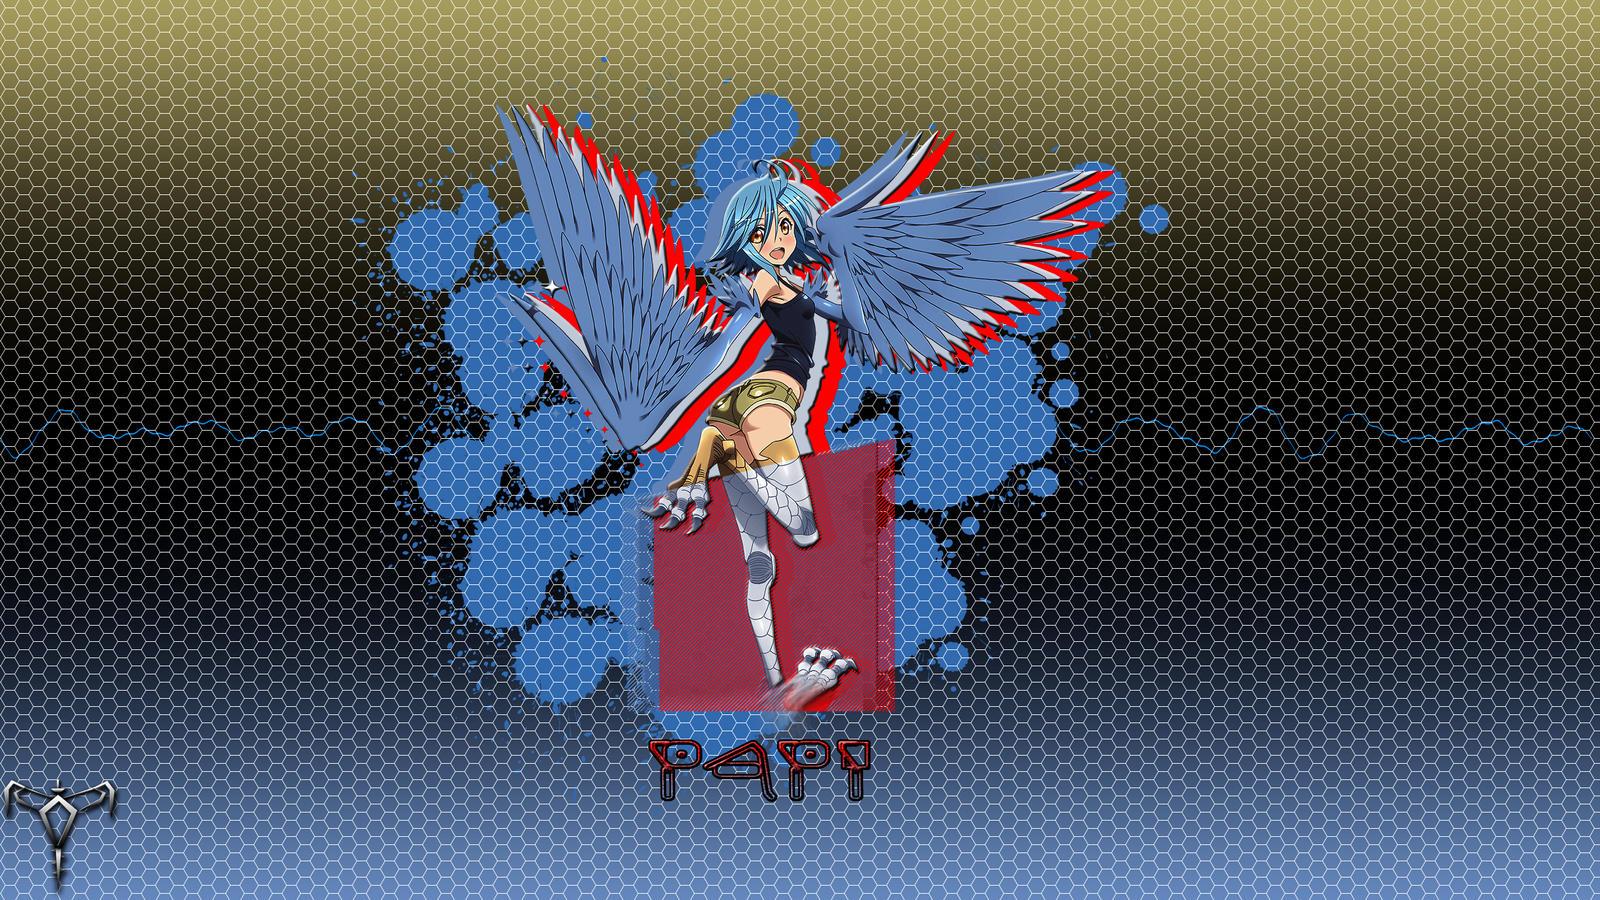 Monster Musume No Iru Nichijou Papi Wallpaper By Mortred039ex On